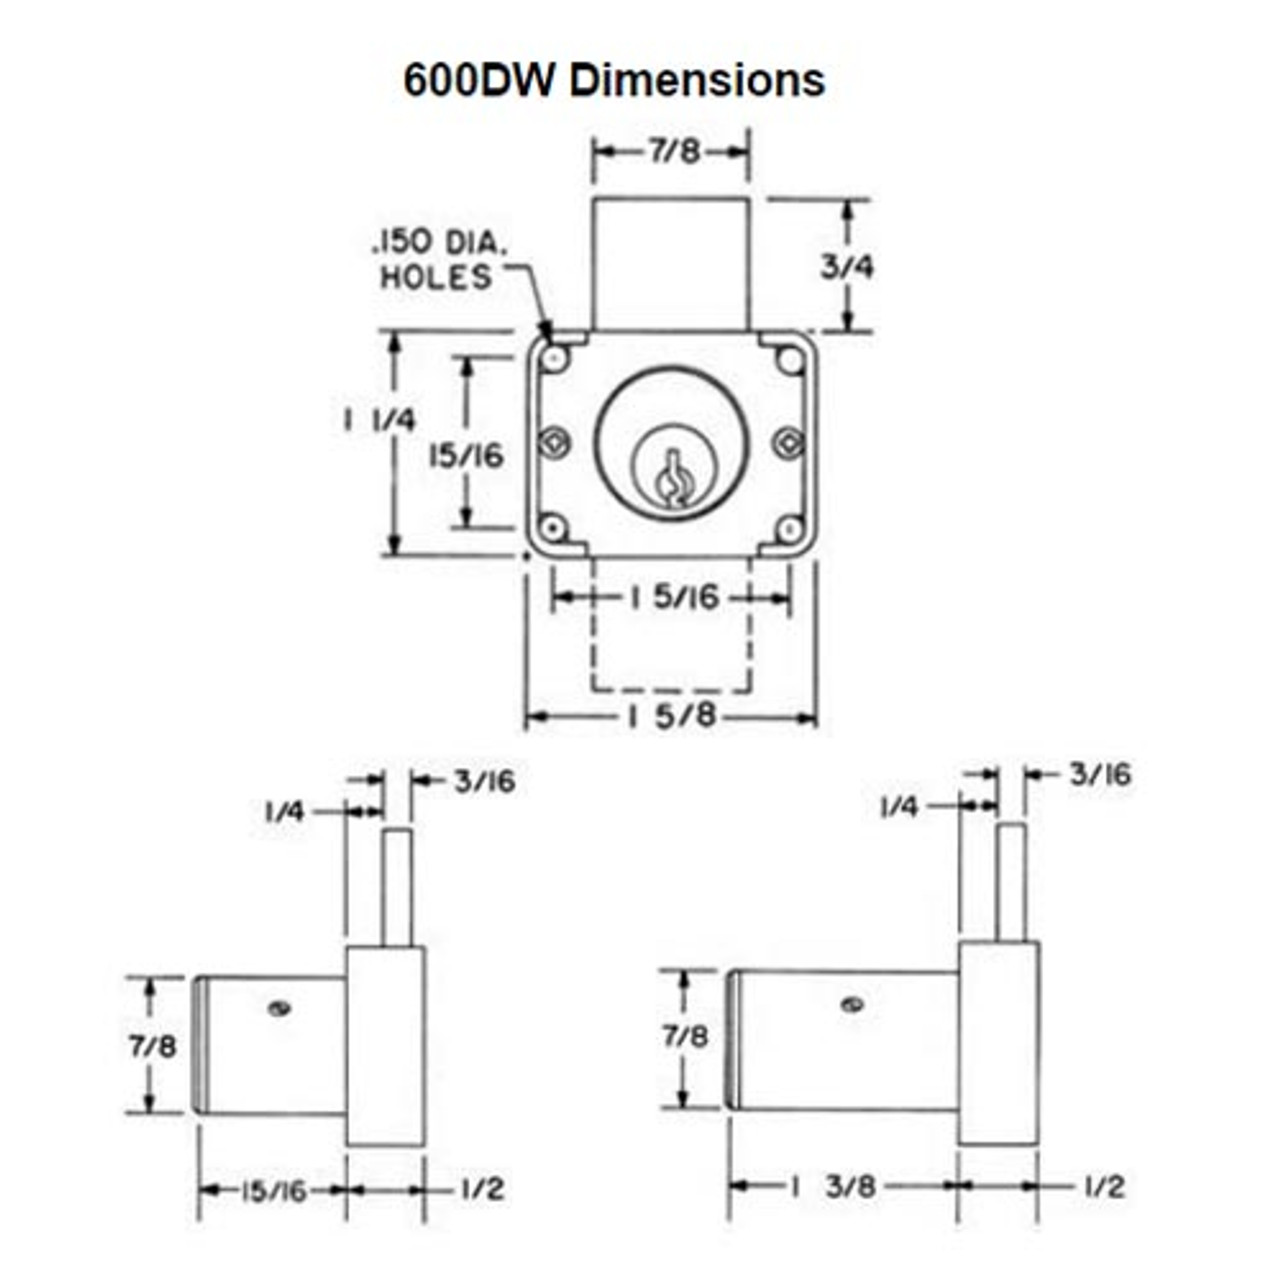 Olympus 600DW-KD-US4-7/8 R Series Drawer Deadbolt Cabinet Locks in Satin Brass